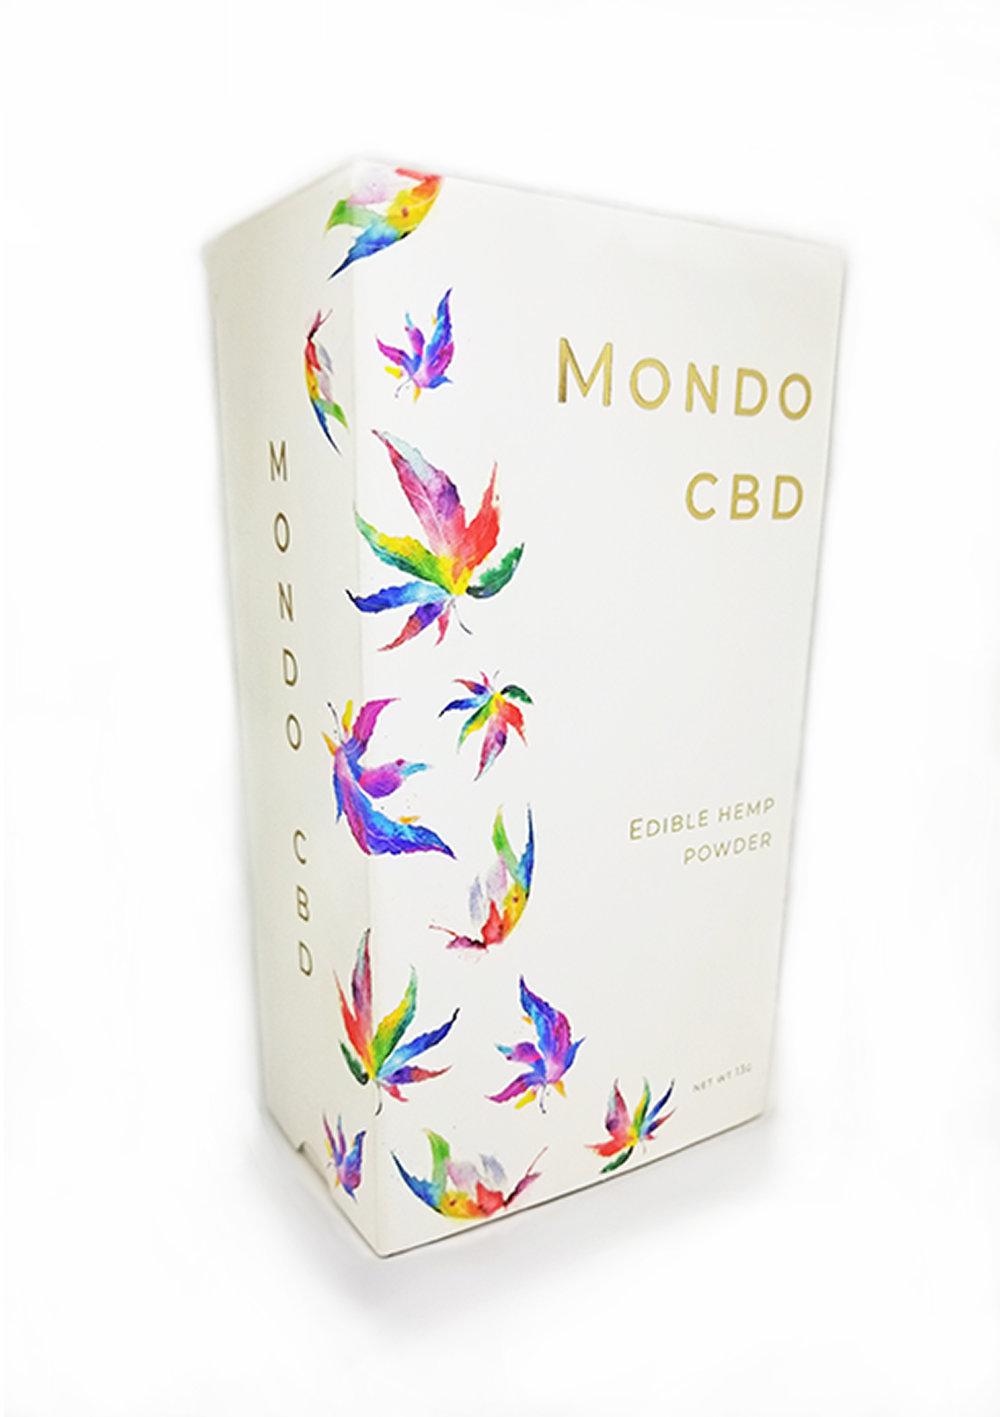 Mondo CBD Box.jpg